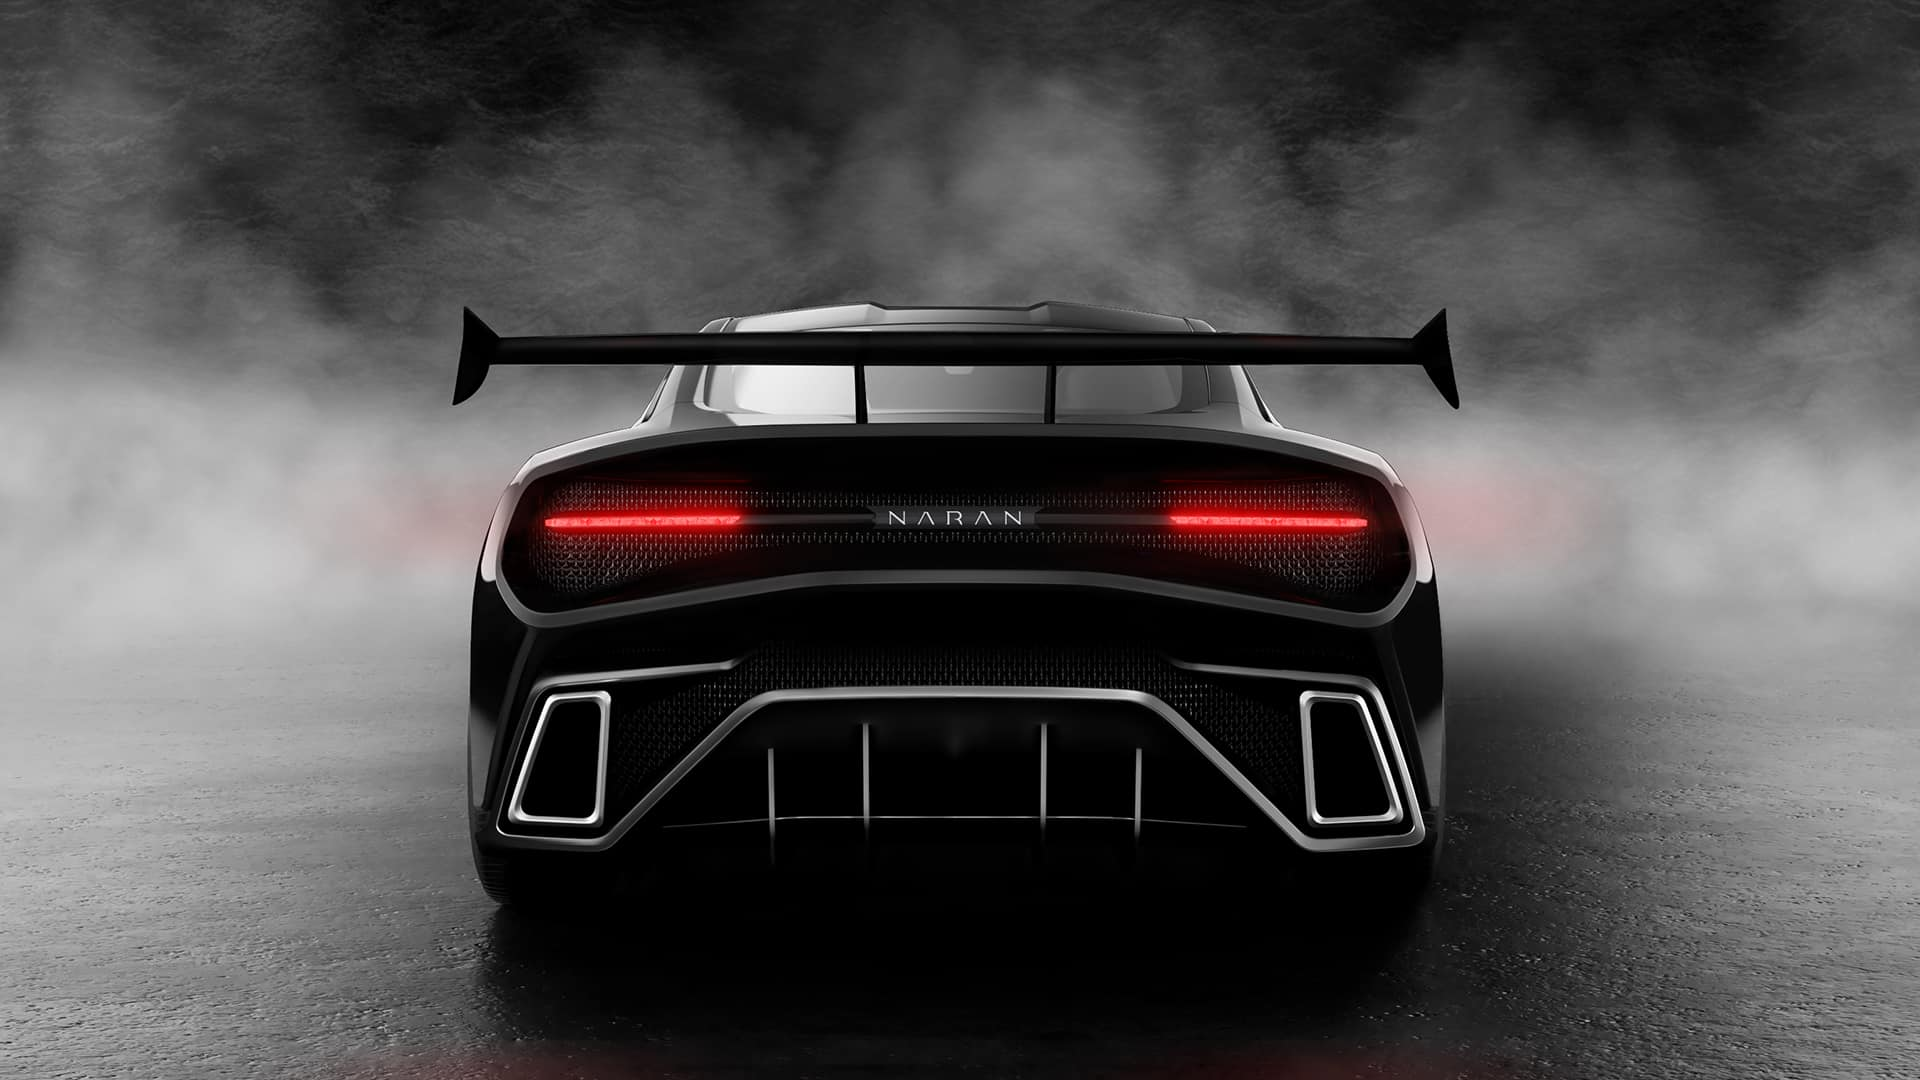 Naran Hyper-Coupe 5